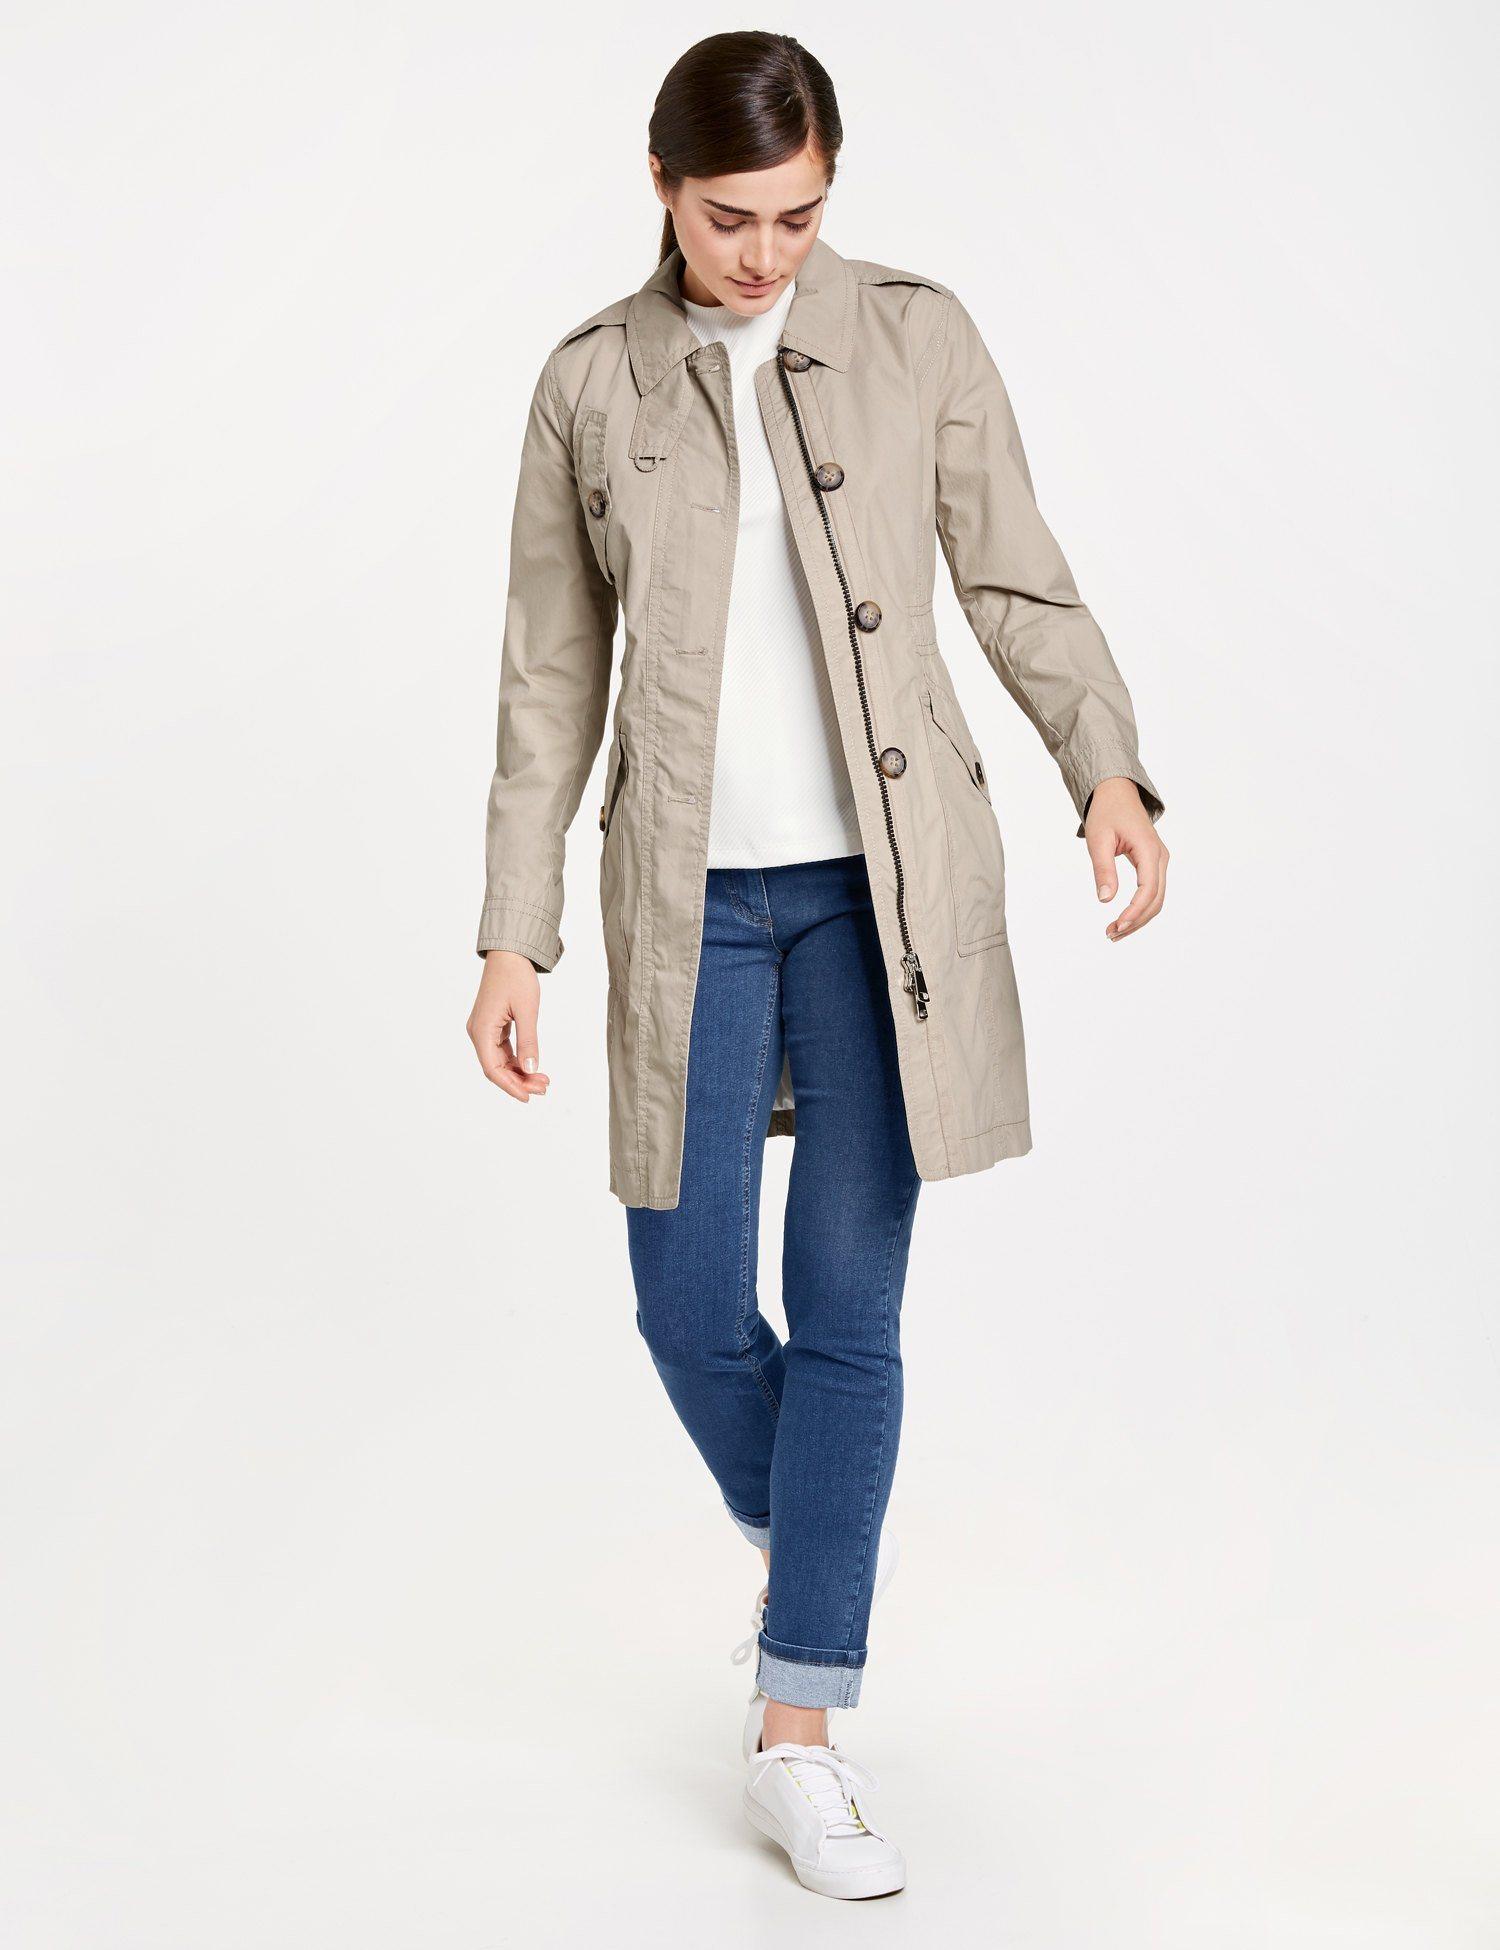 TAIFUN Mantel nicht Wolle »Trenchcoat aus Baumwolle« | Bekleidung > Mäntel > Trenchcoats | Wolle - Baumwolle - Polyester | Taifun